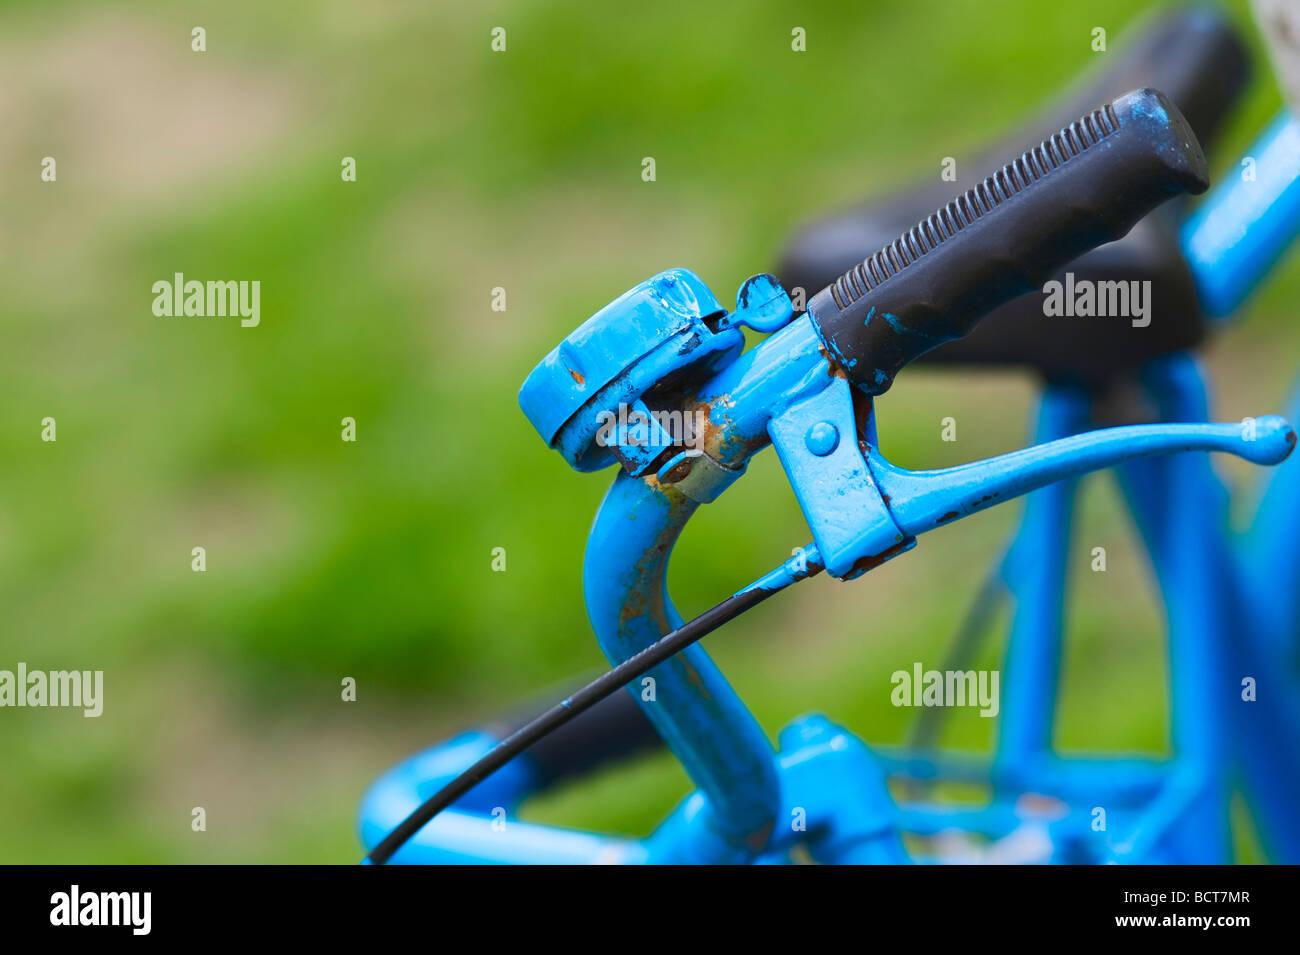 Guidon d'un vieux vélo peint en bleu Photo Stock